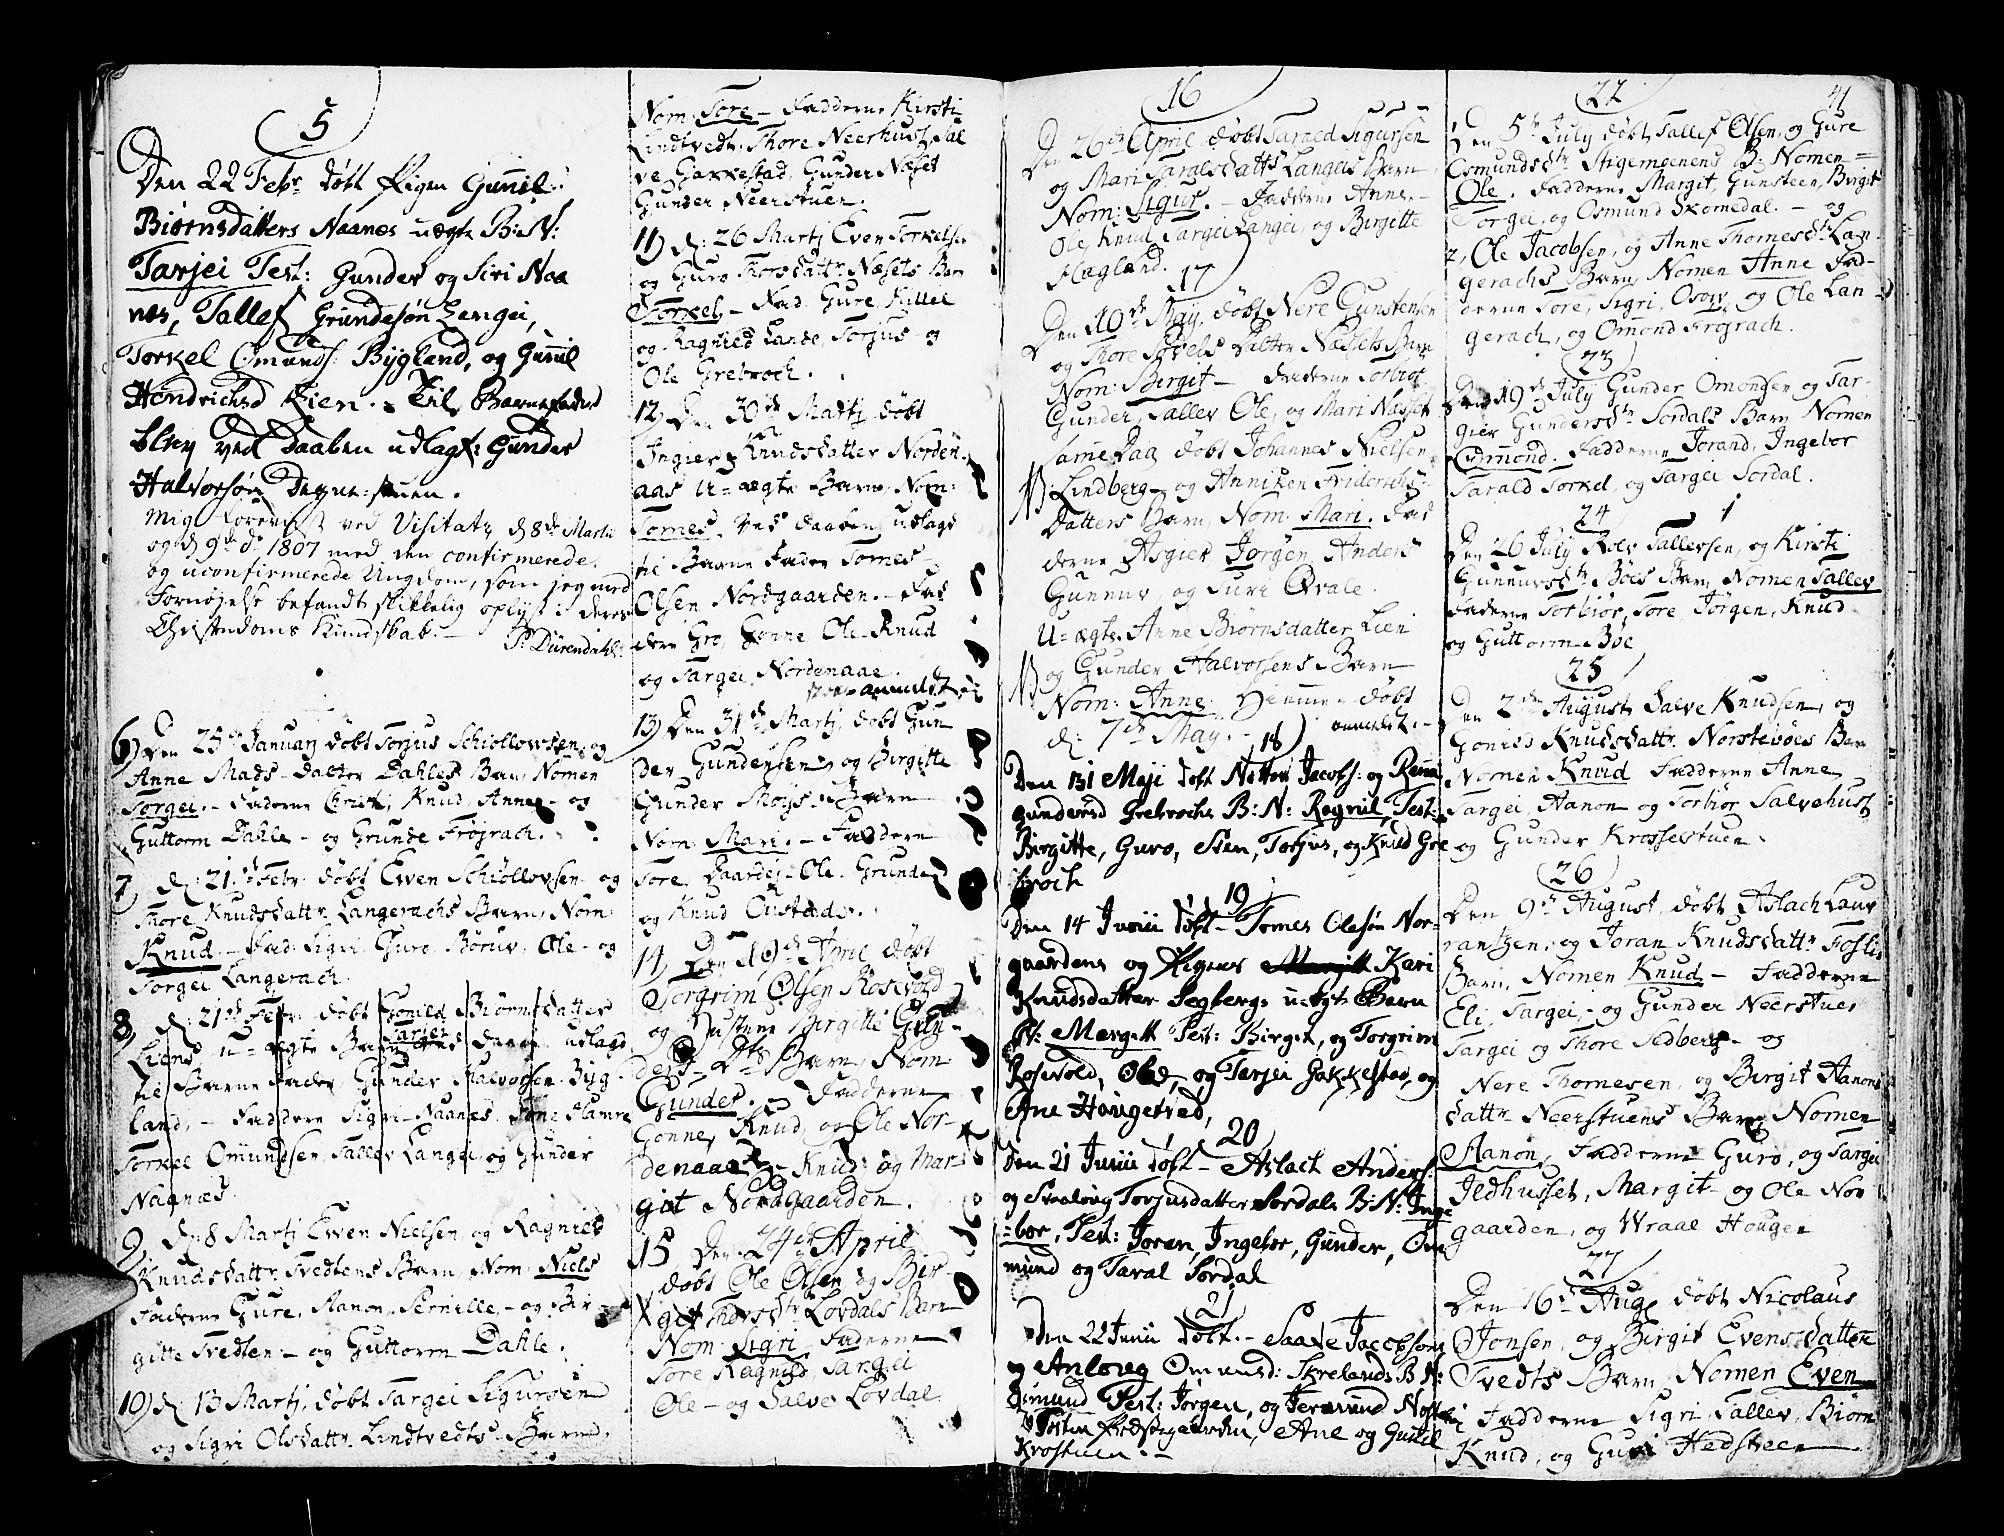 SAK, Bygland sokneprestkontor, F/Fa/Fab/L0002: Ministerialbok nr. A 2, 1766-1816, s. 41